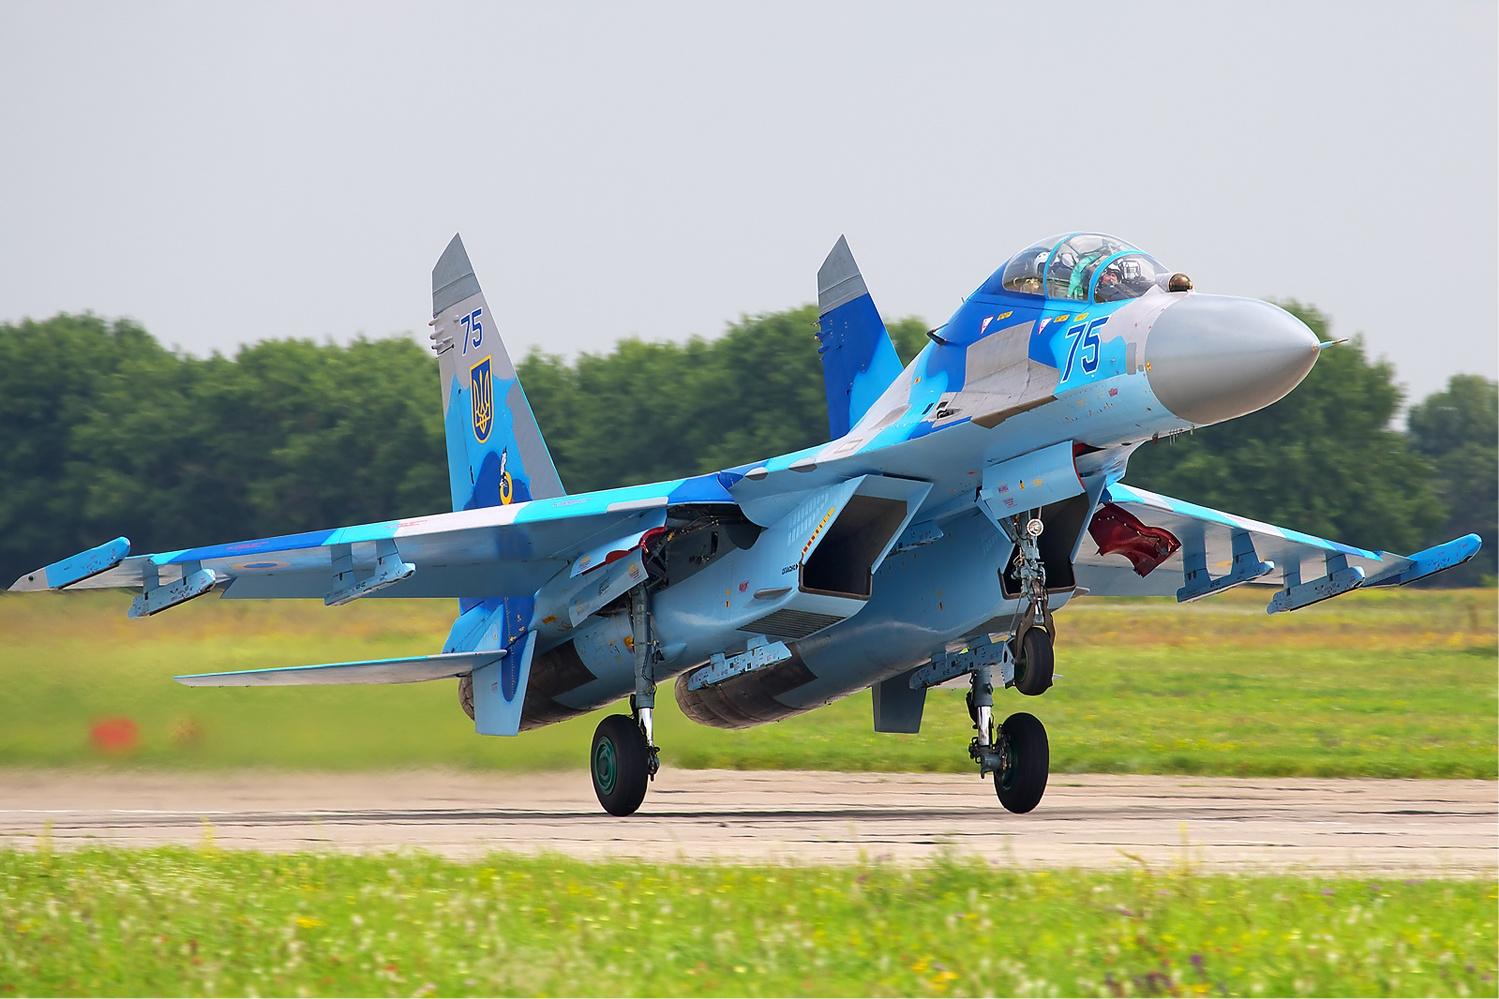 Click image for larger version  Name:Sukhoi_Su-27UB_Belyakov.jpg Views:1339 Size:681.2 KB ID:2178507